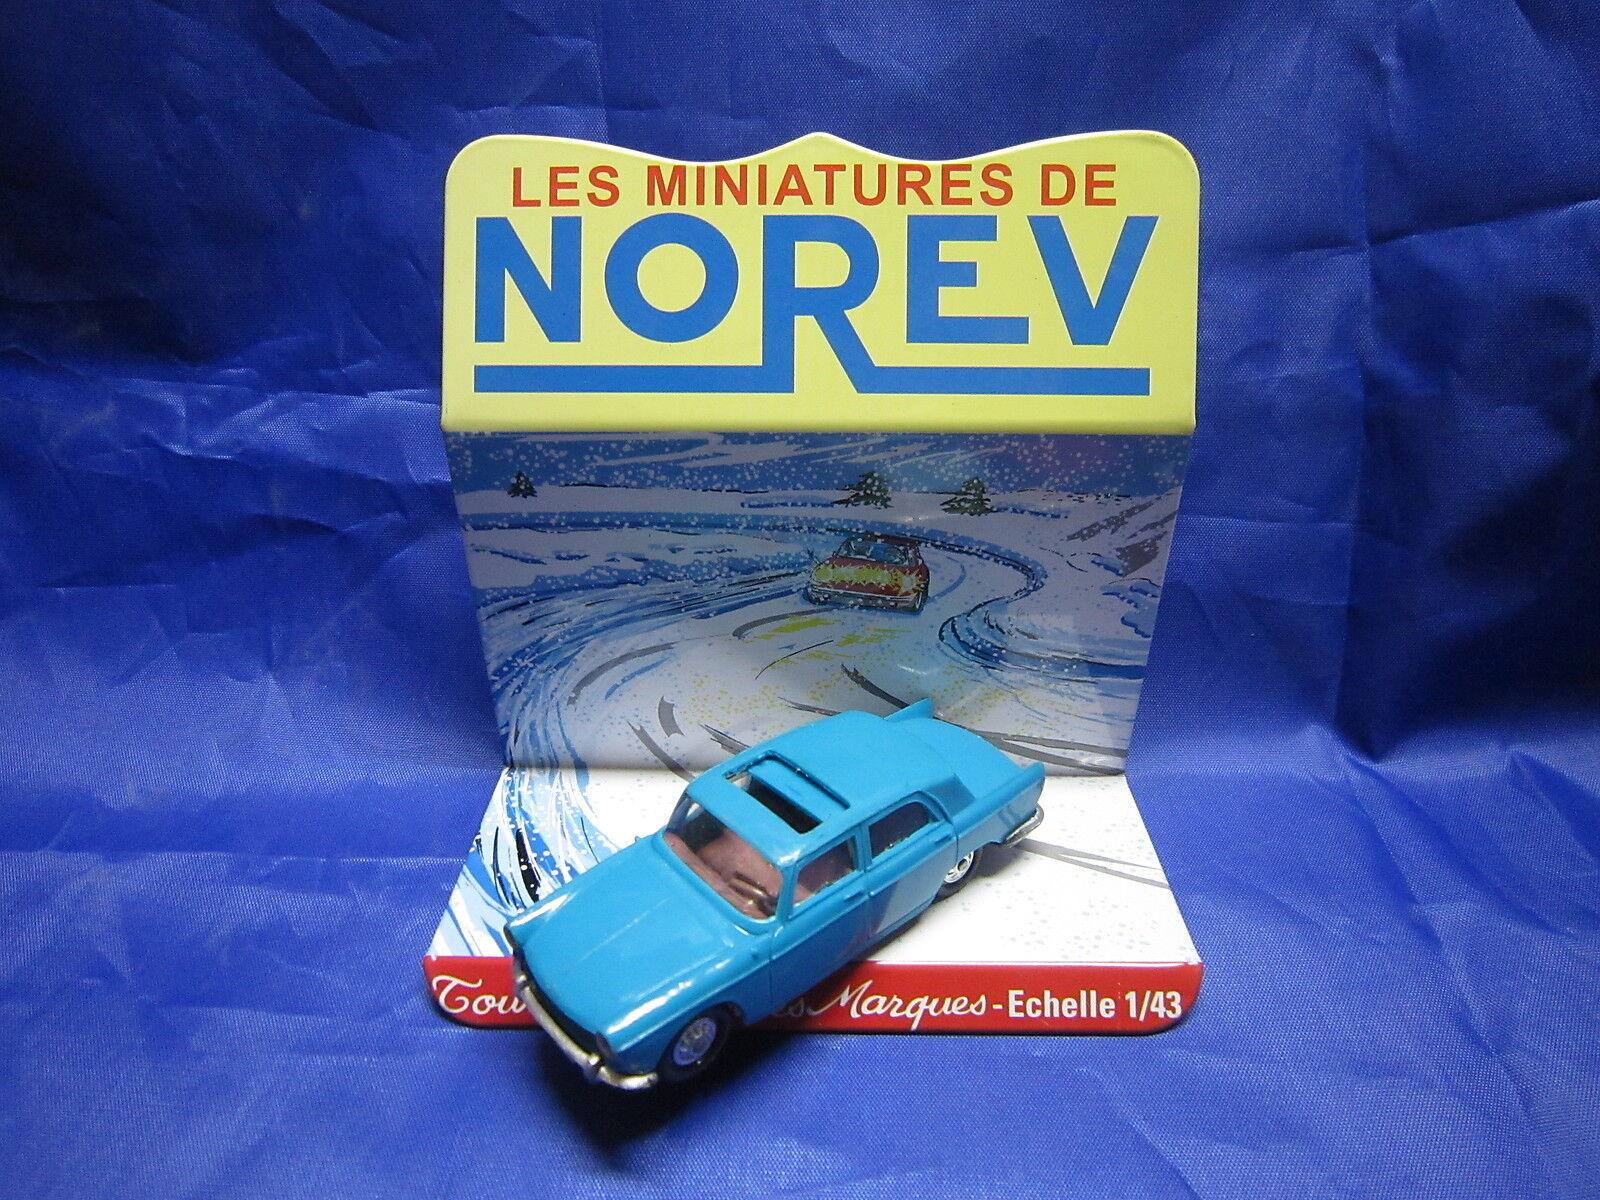 Dv6229 norev peugeot 404 berline plastiksprengstoff Blau turquoise 1 ° typ rf 51 1   43 der